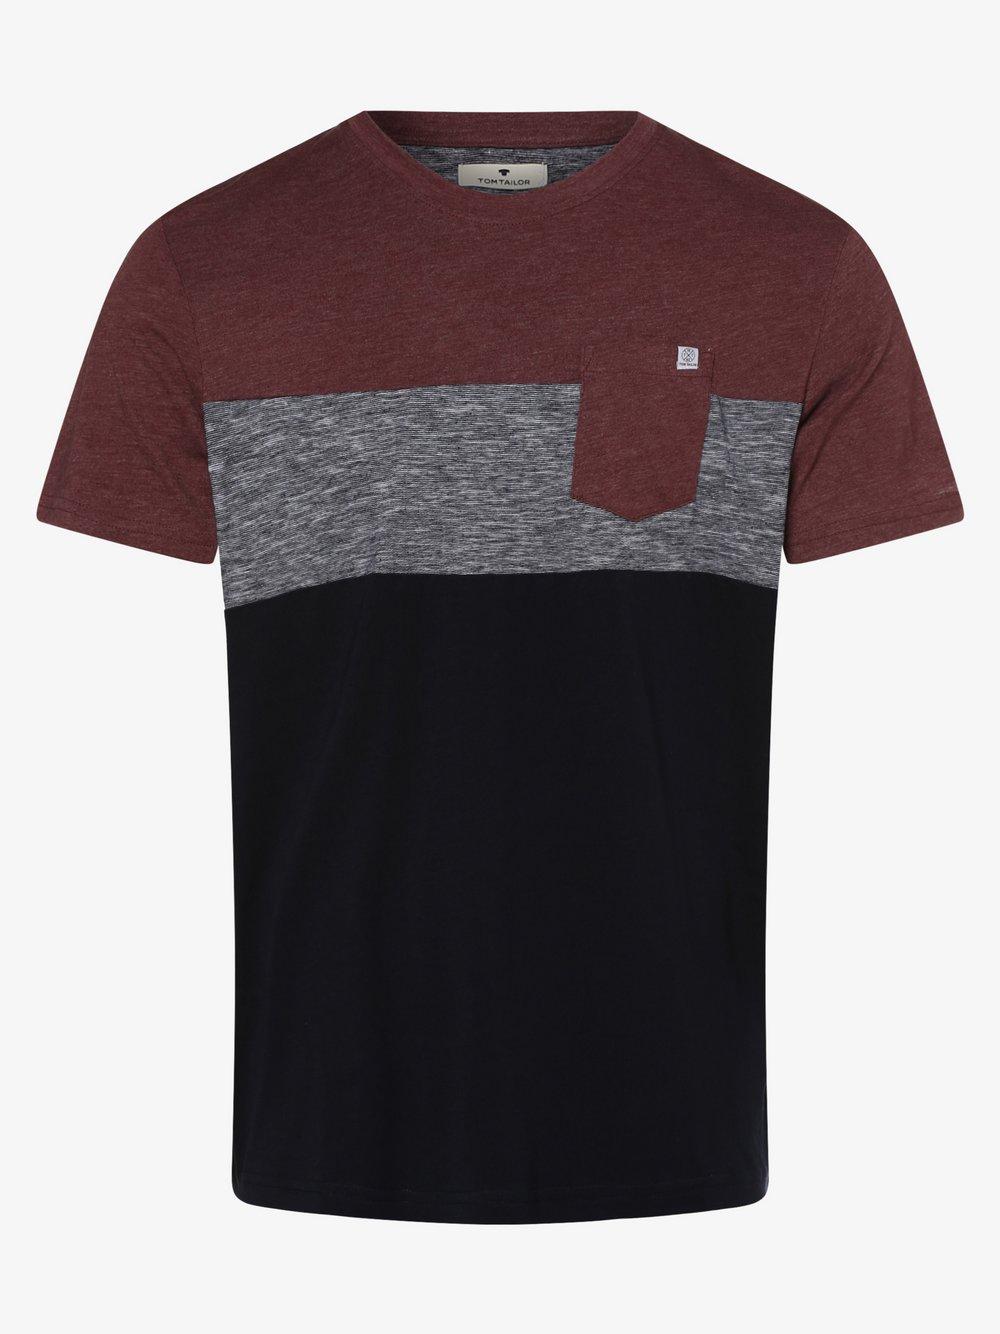 Tom Tailor – T-shirt męski, czerwony Van Graaf 487273-0002